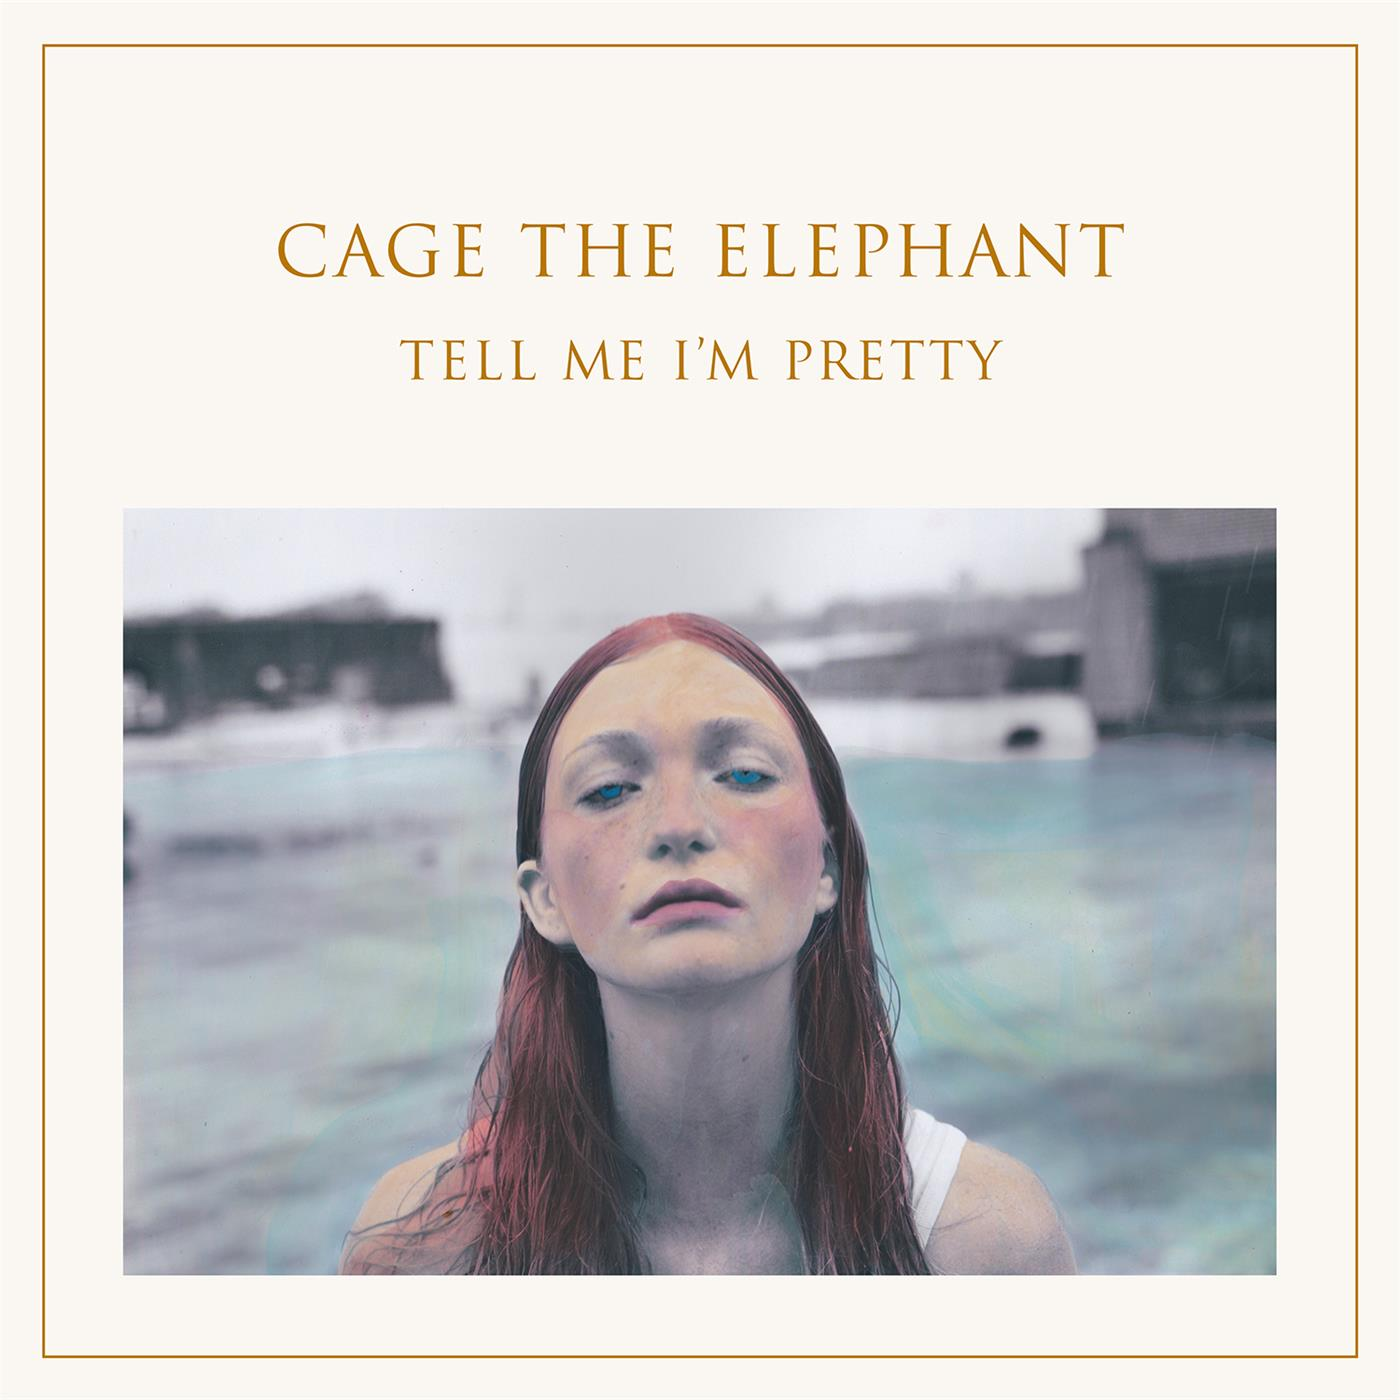 Cage The Elephant - Tell Me I'm Pretty [LP]